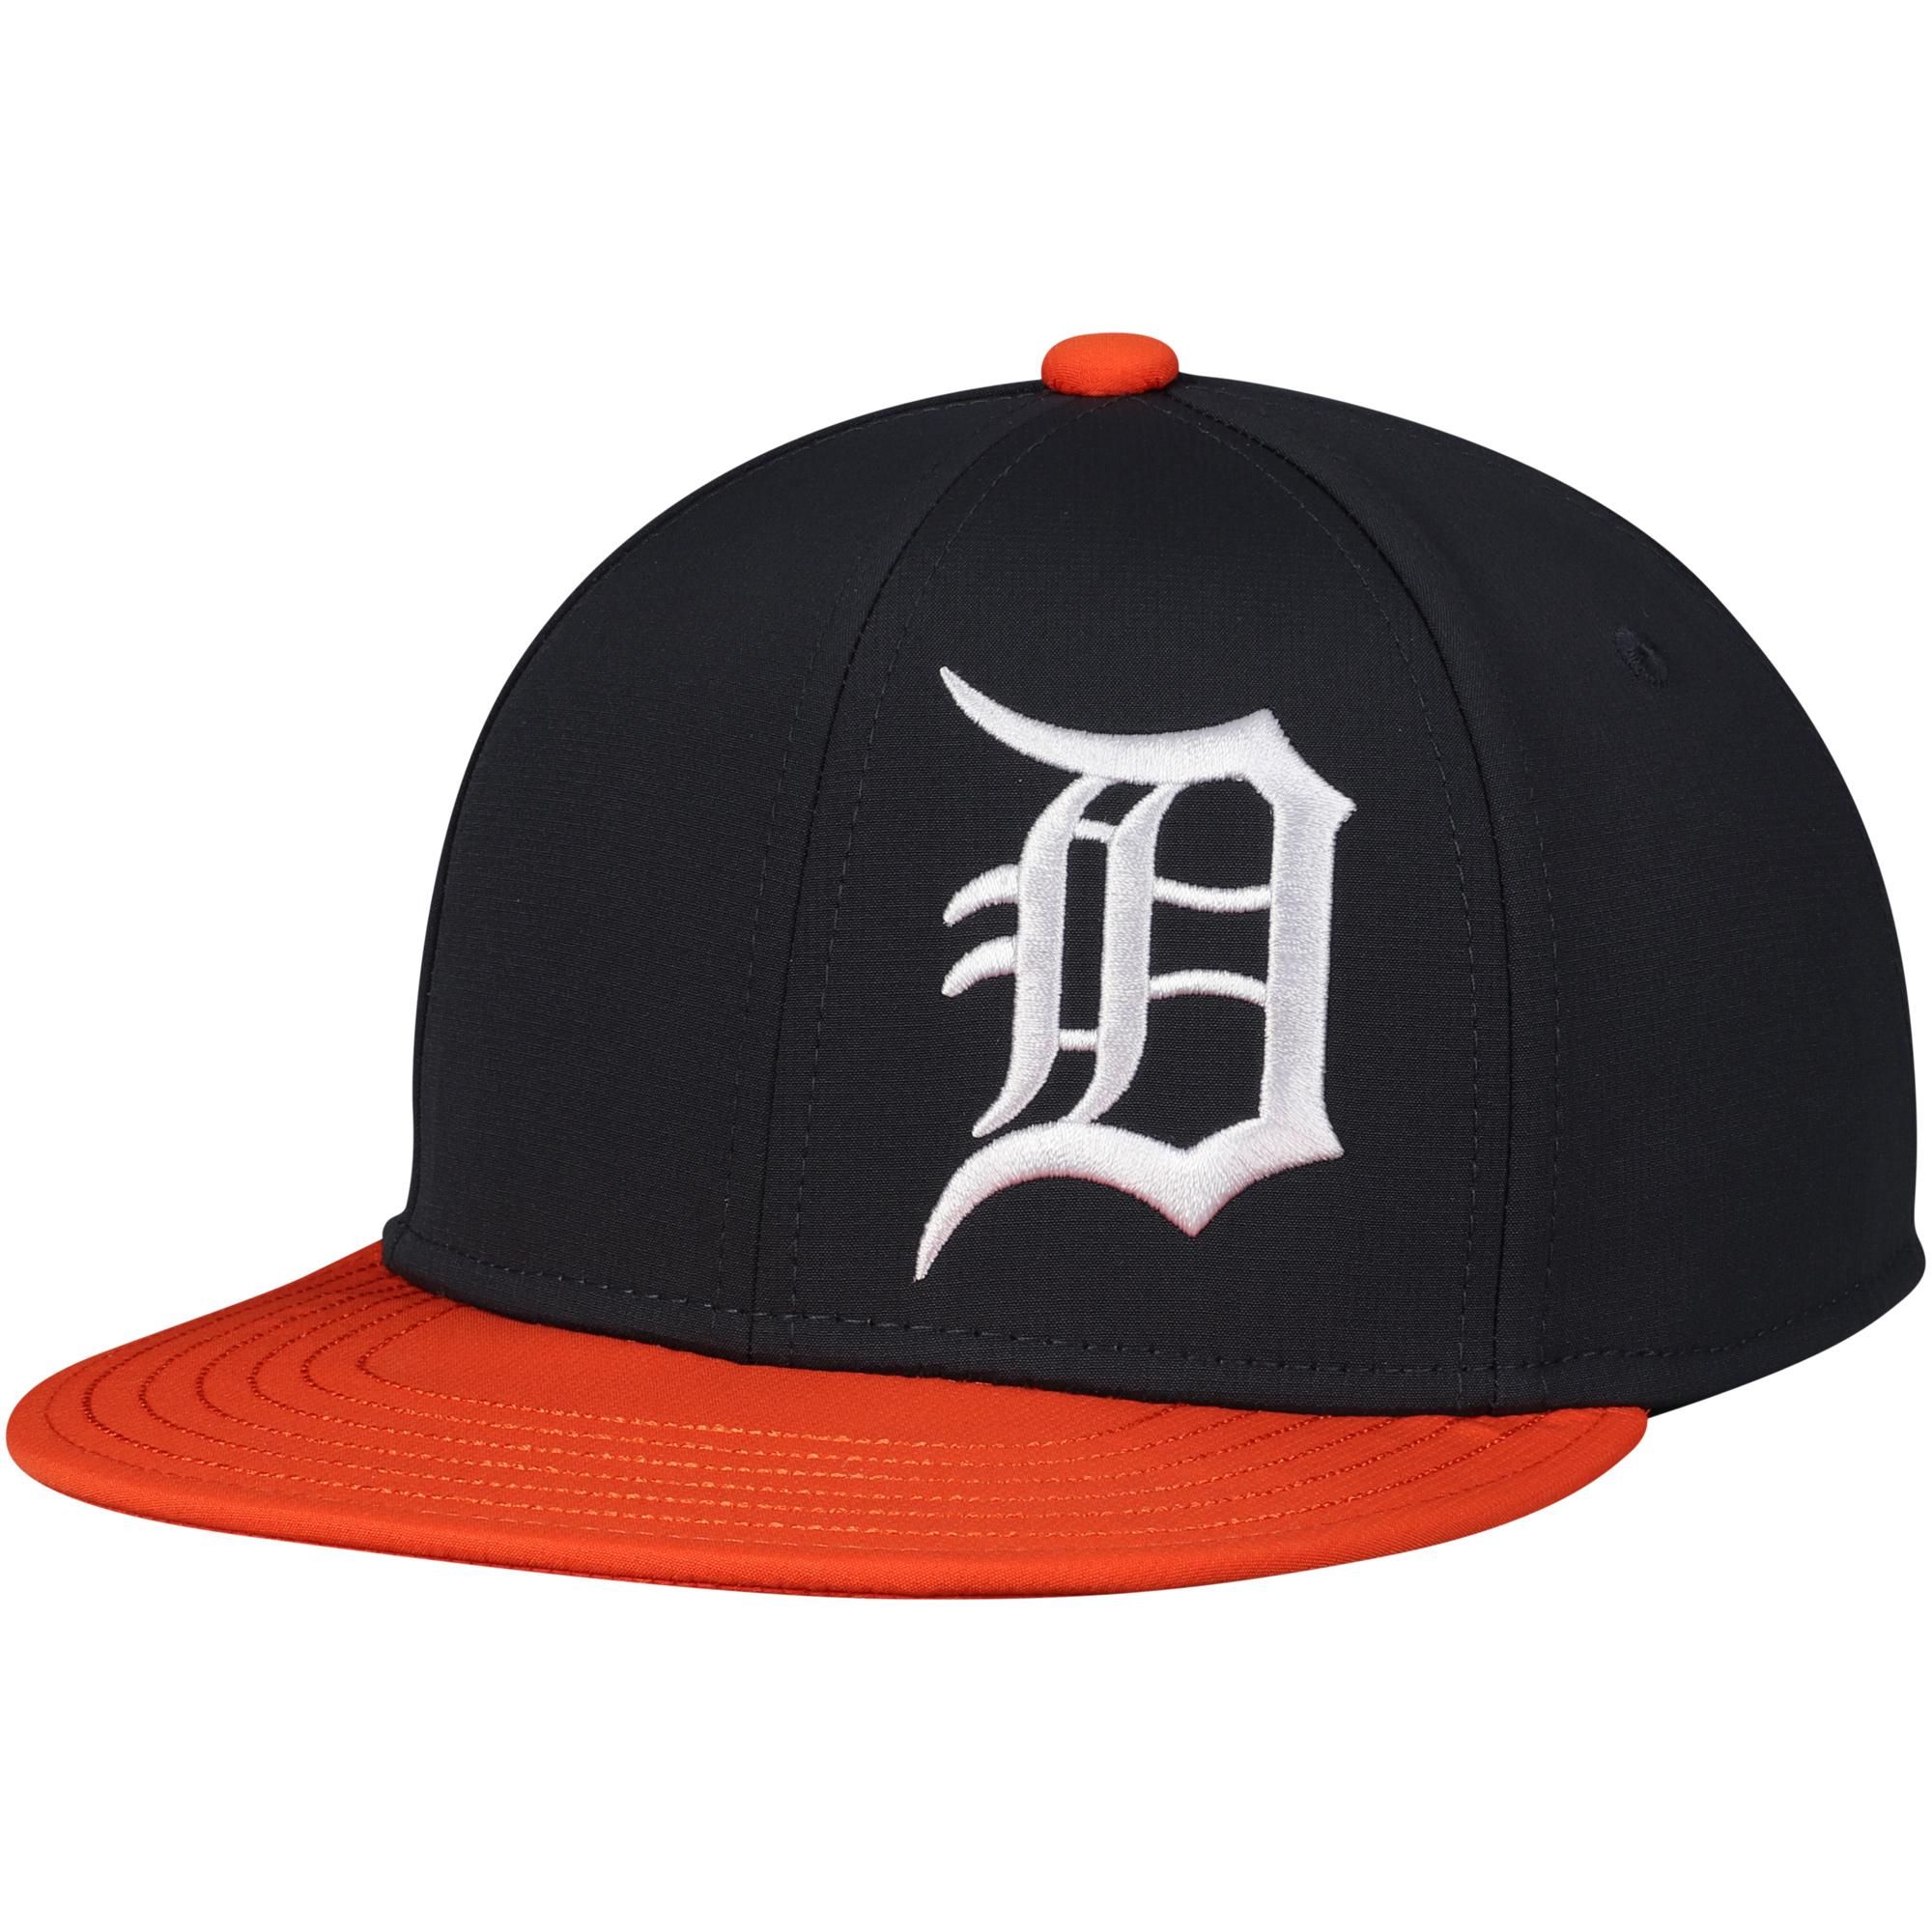 Detroit Tigers Under Armour Youth Big Logo Snapback Adjustable Hat - Black - OSFA